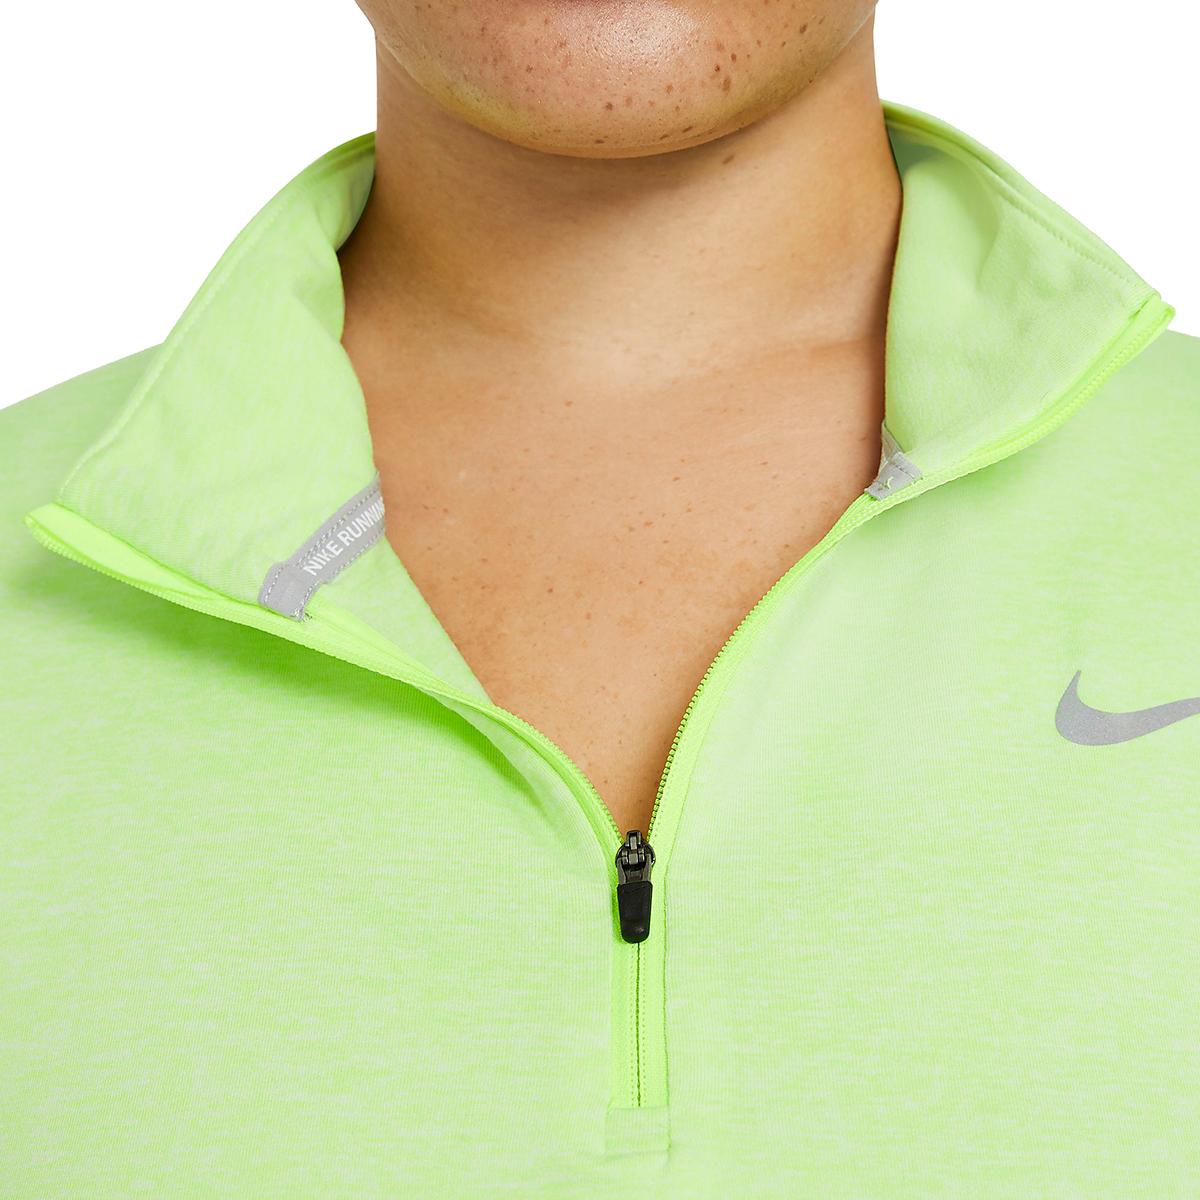 Women's Nike Element Top 1/2 Zip Long Sleeve - Color: Volt/Barely Volt/Htr/Reflective Silver - Size: XS, Volt/Barely Volt/Htr/Reflective Silver, large, image 4